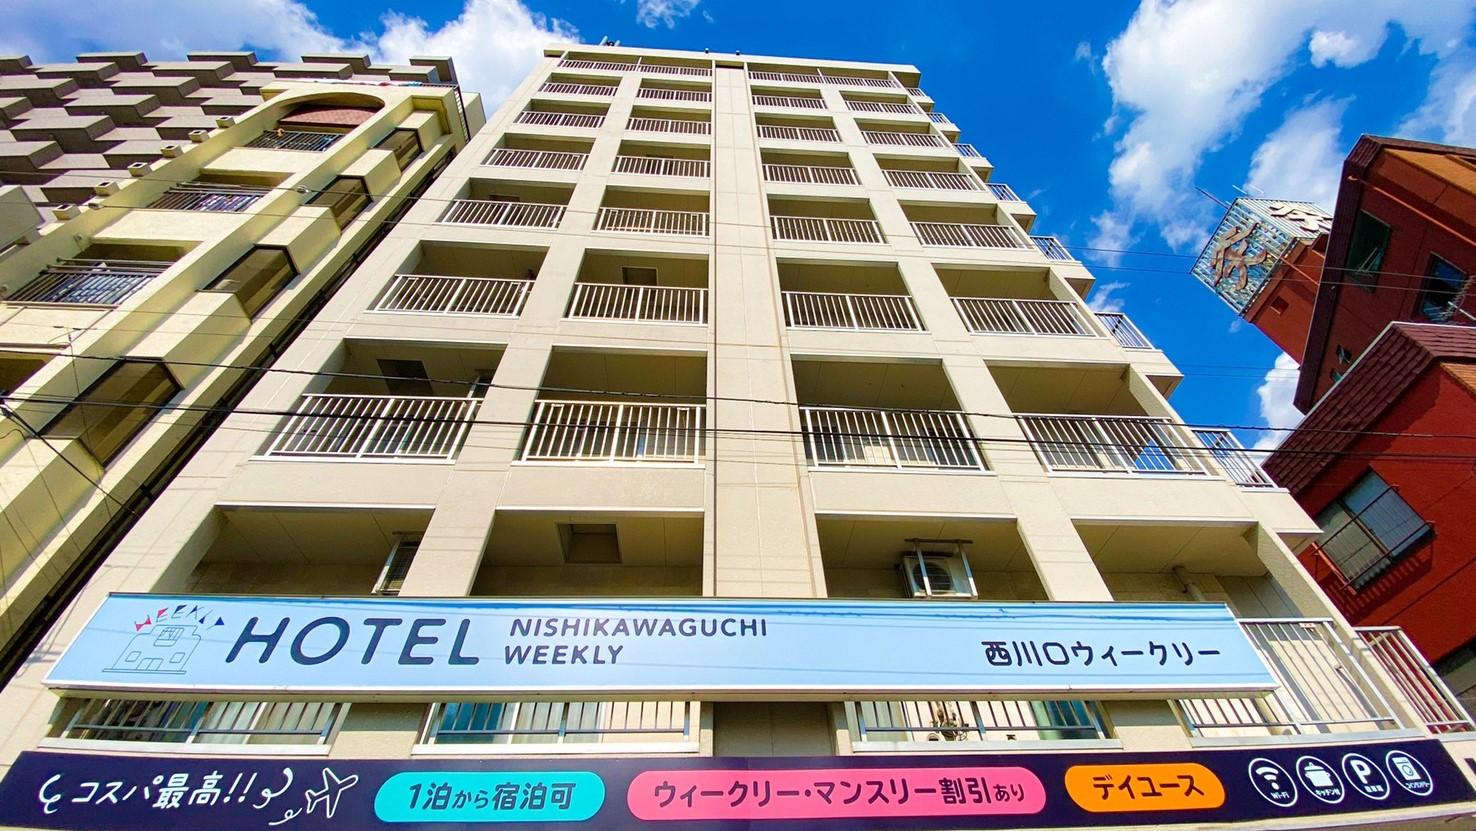 OYO 44662 Nishikawaguchi Weekly